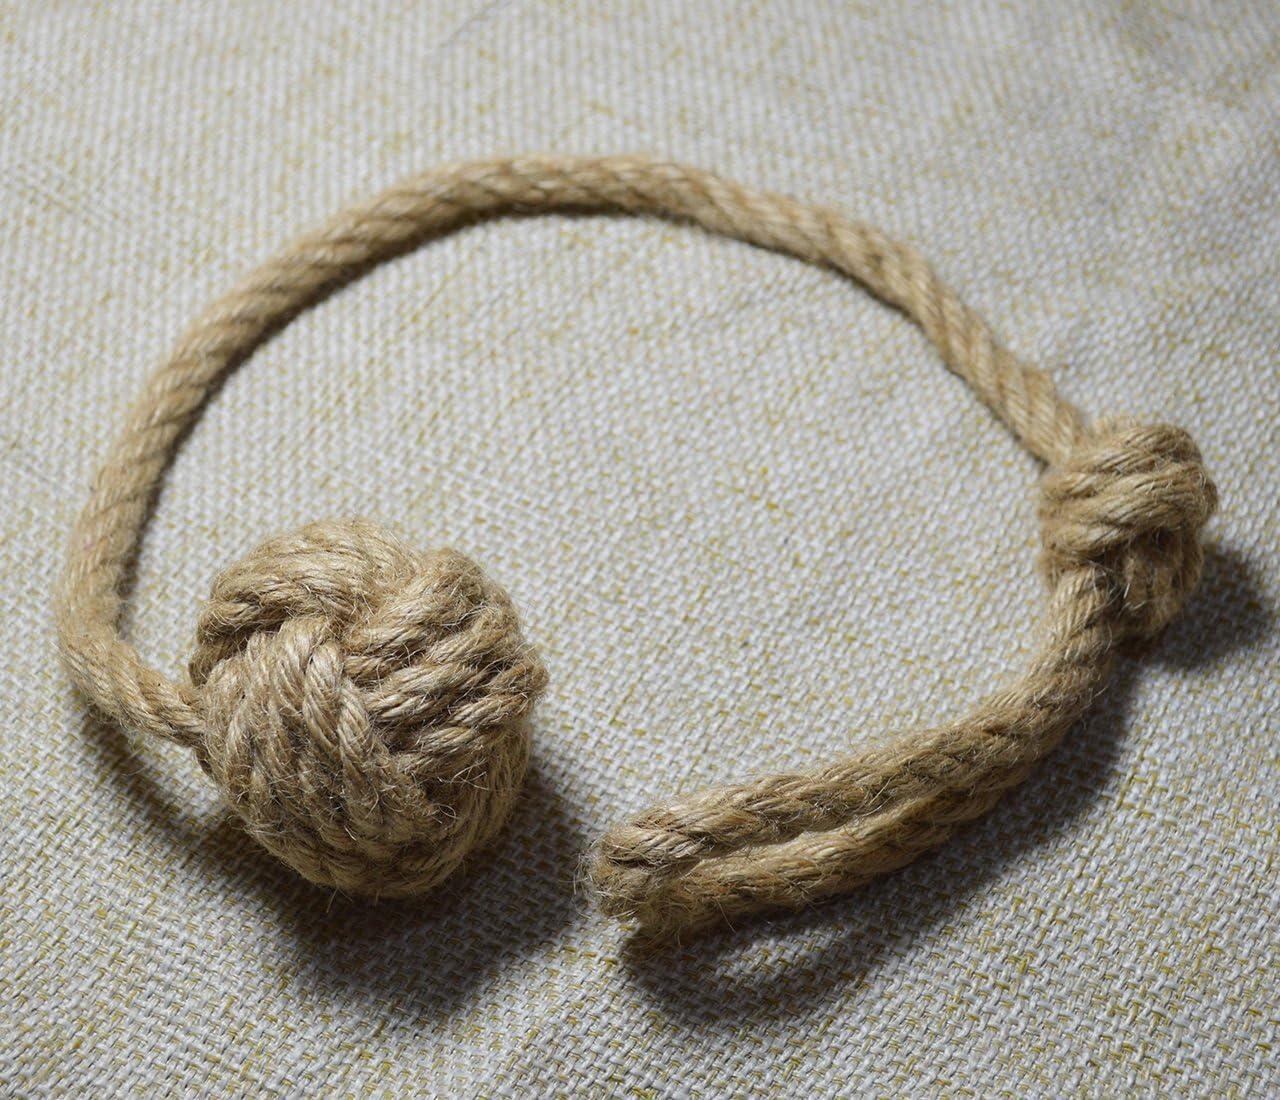 Monkey Fist Knot Shabby Chic White Cotton Rope Monkey Fist Knot Curtain Tie Backs Rustic Beach Tiebacks Nautical Curtain Tie Back